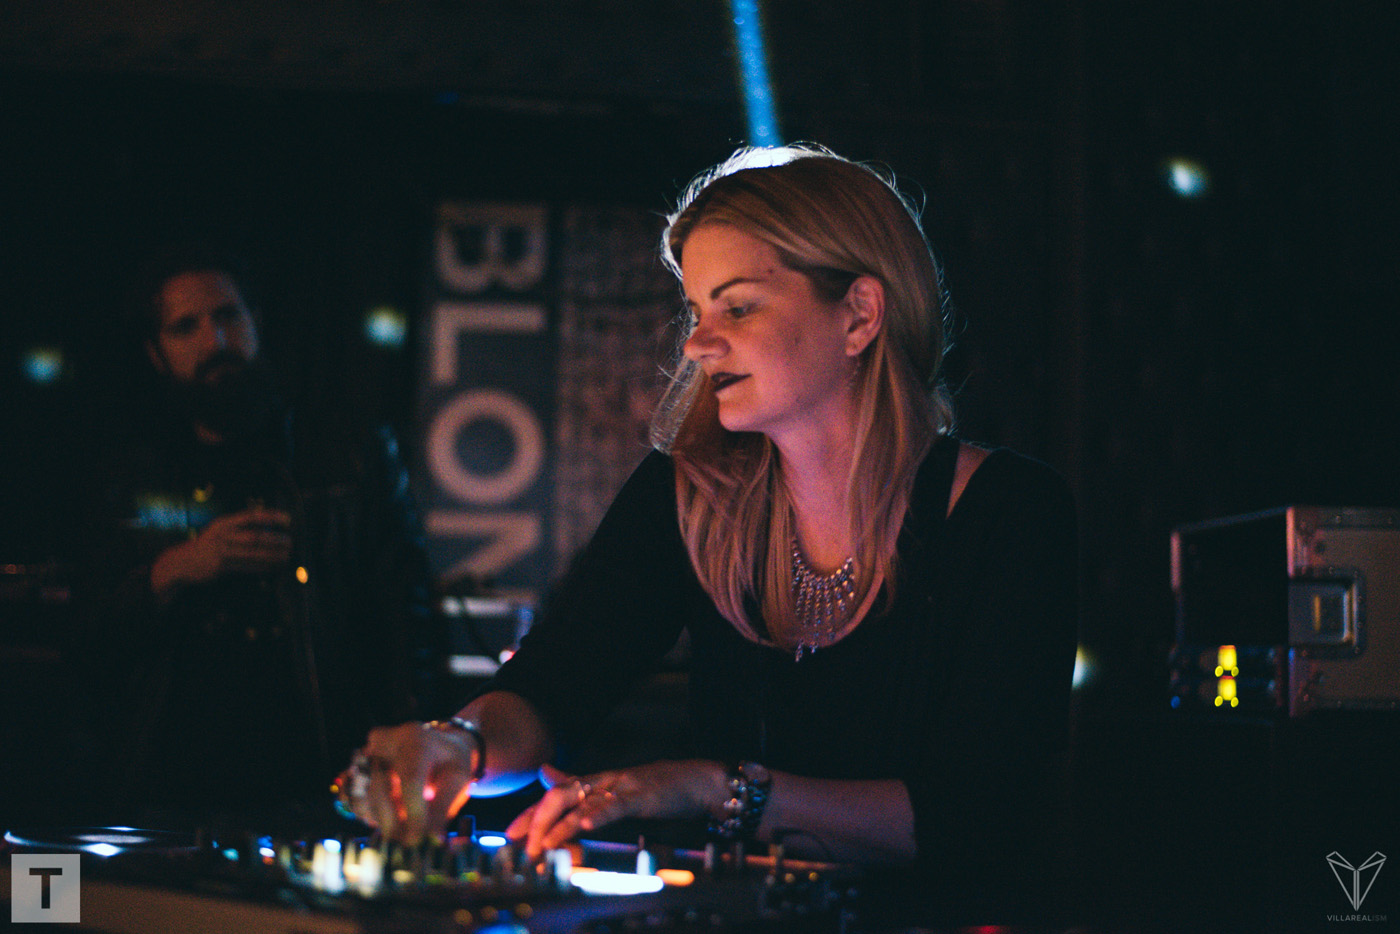 T is 4 Techno @ Blonde 12/5/17